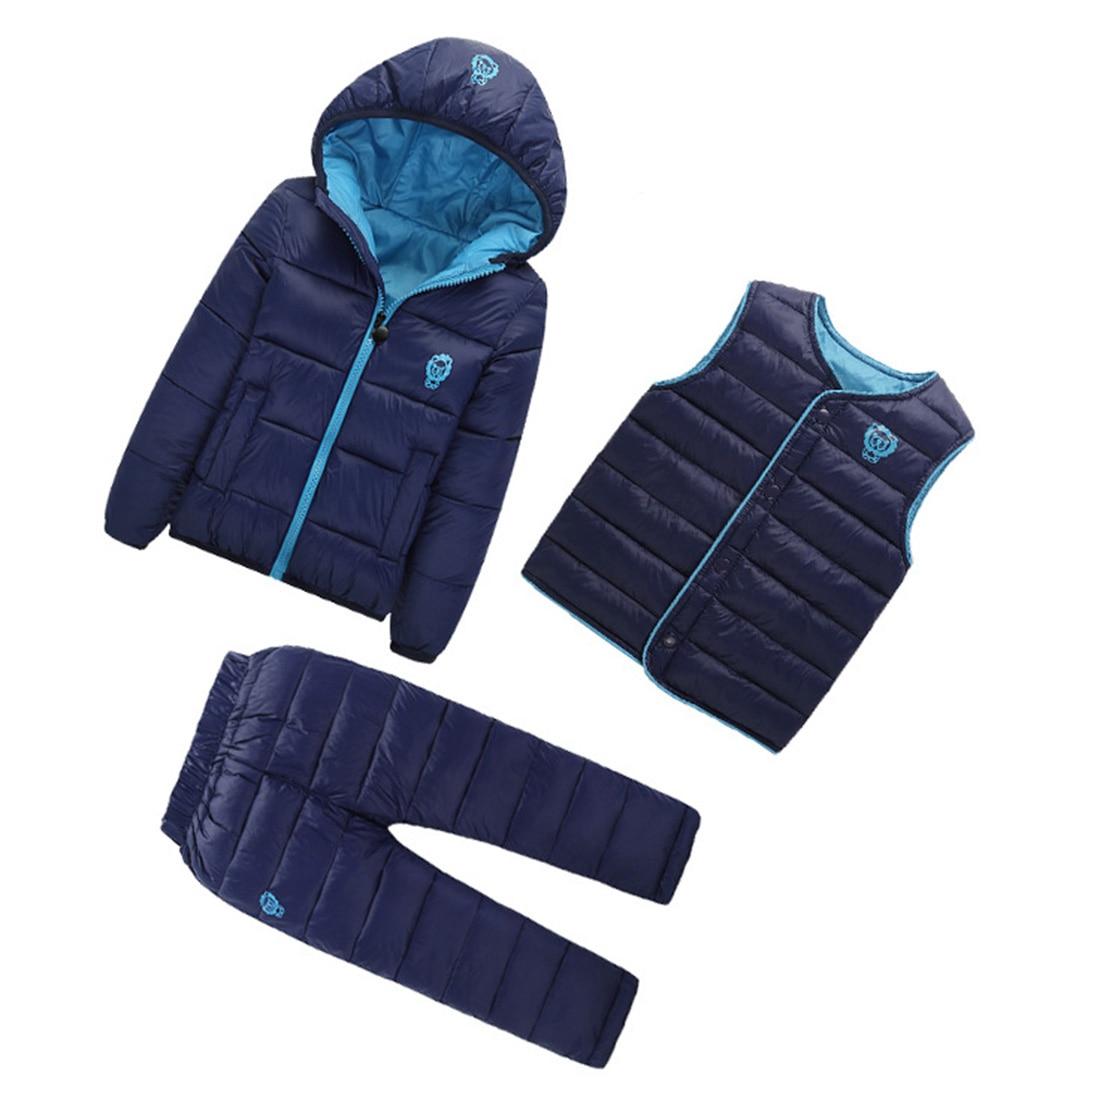 3 Pcs Lot Winter Baby Girls Boys Clothes Sets Children Down Cotton padded Coat 6 Colors 6 Size